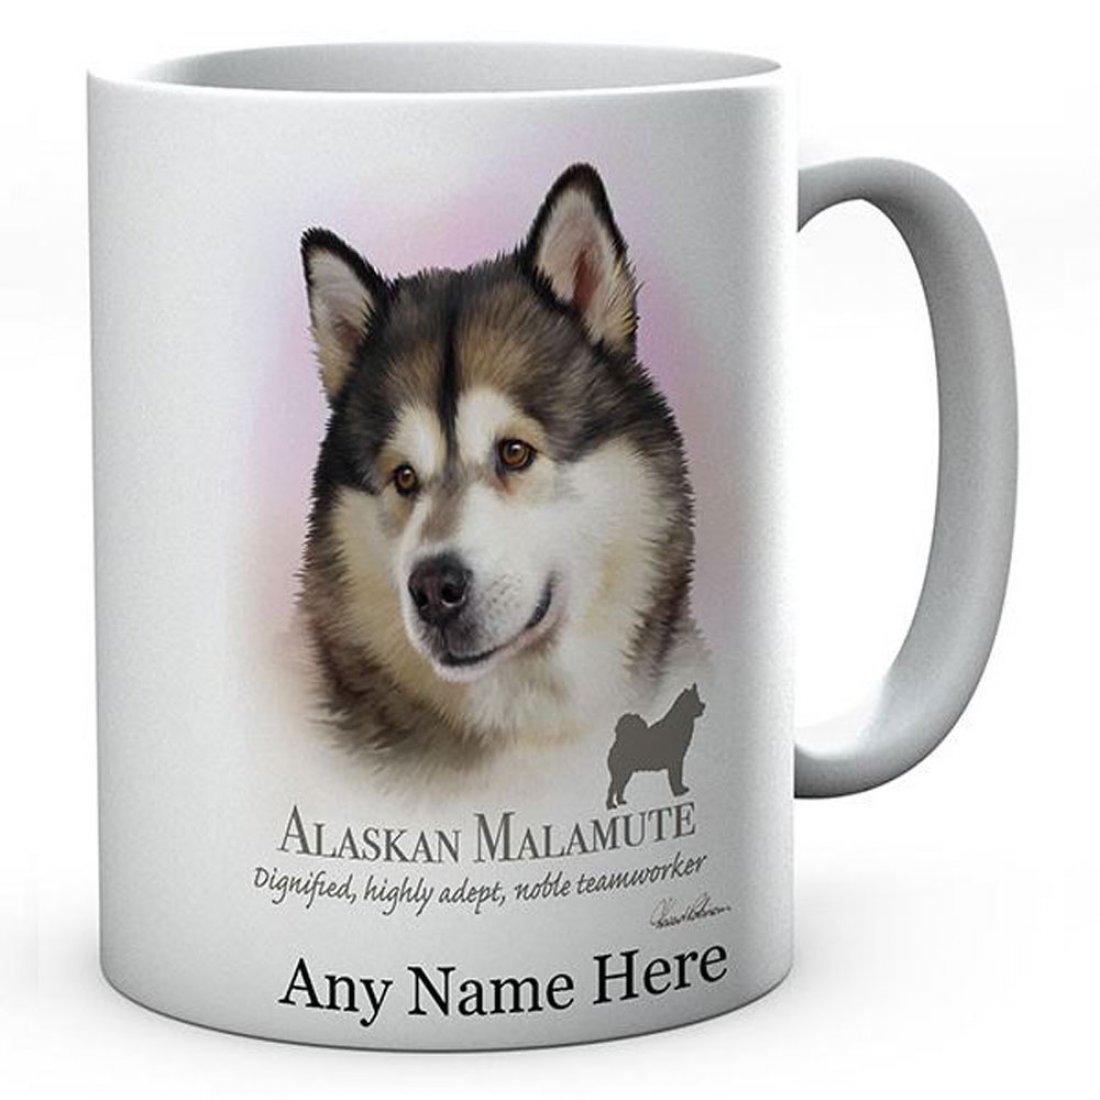 Personalised Alaskan Malamute Dog Mug